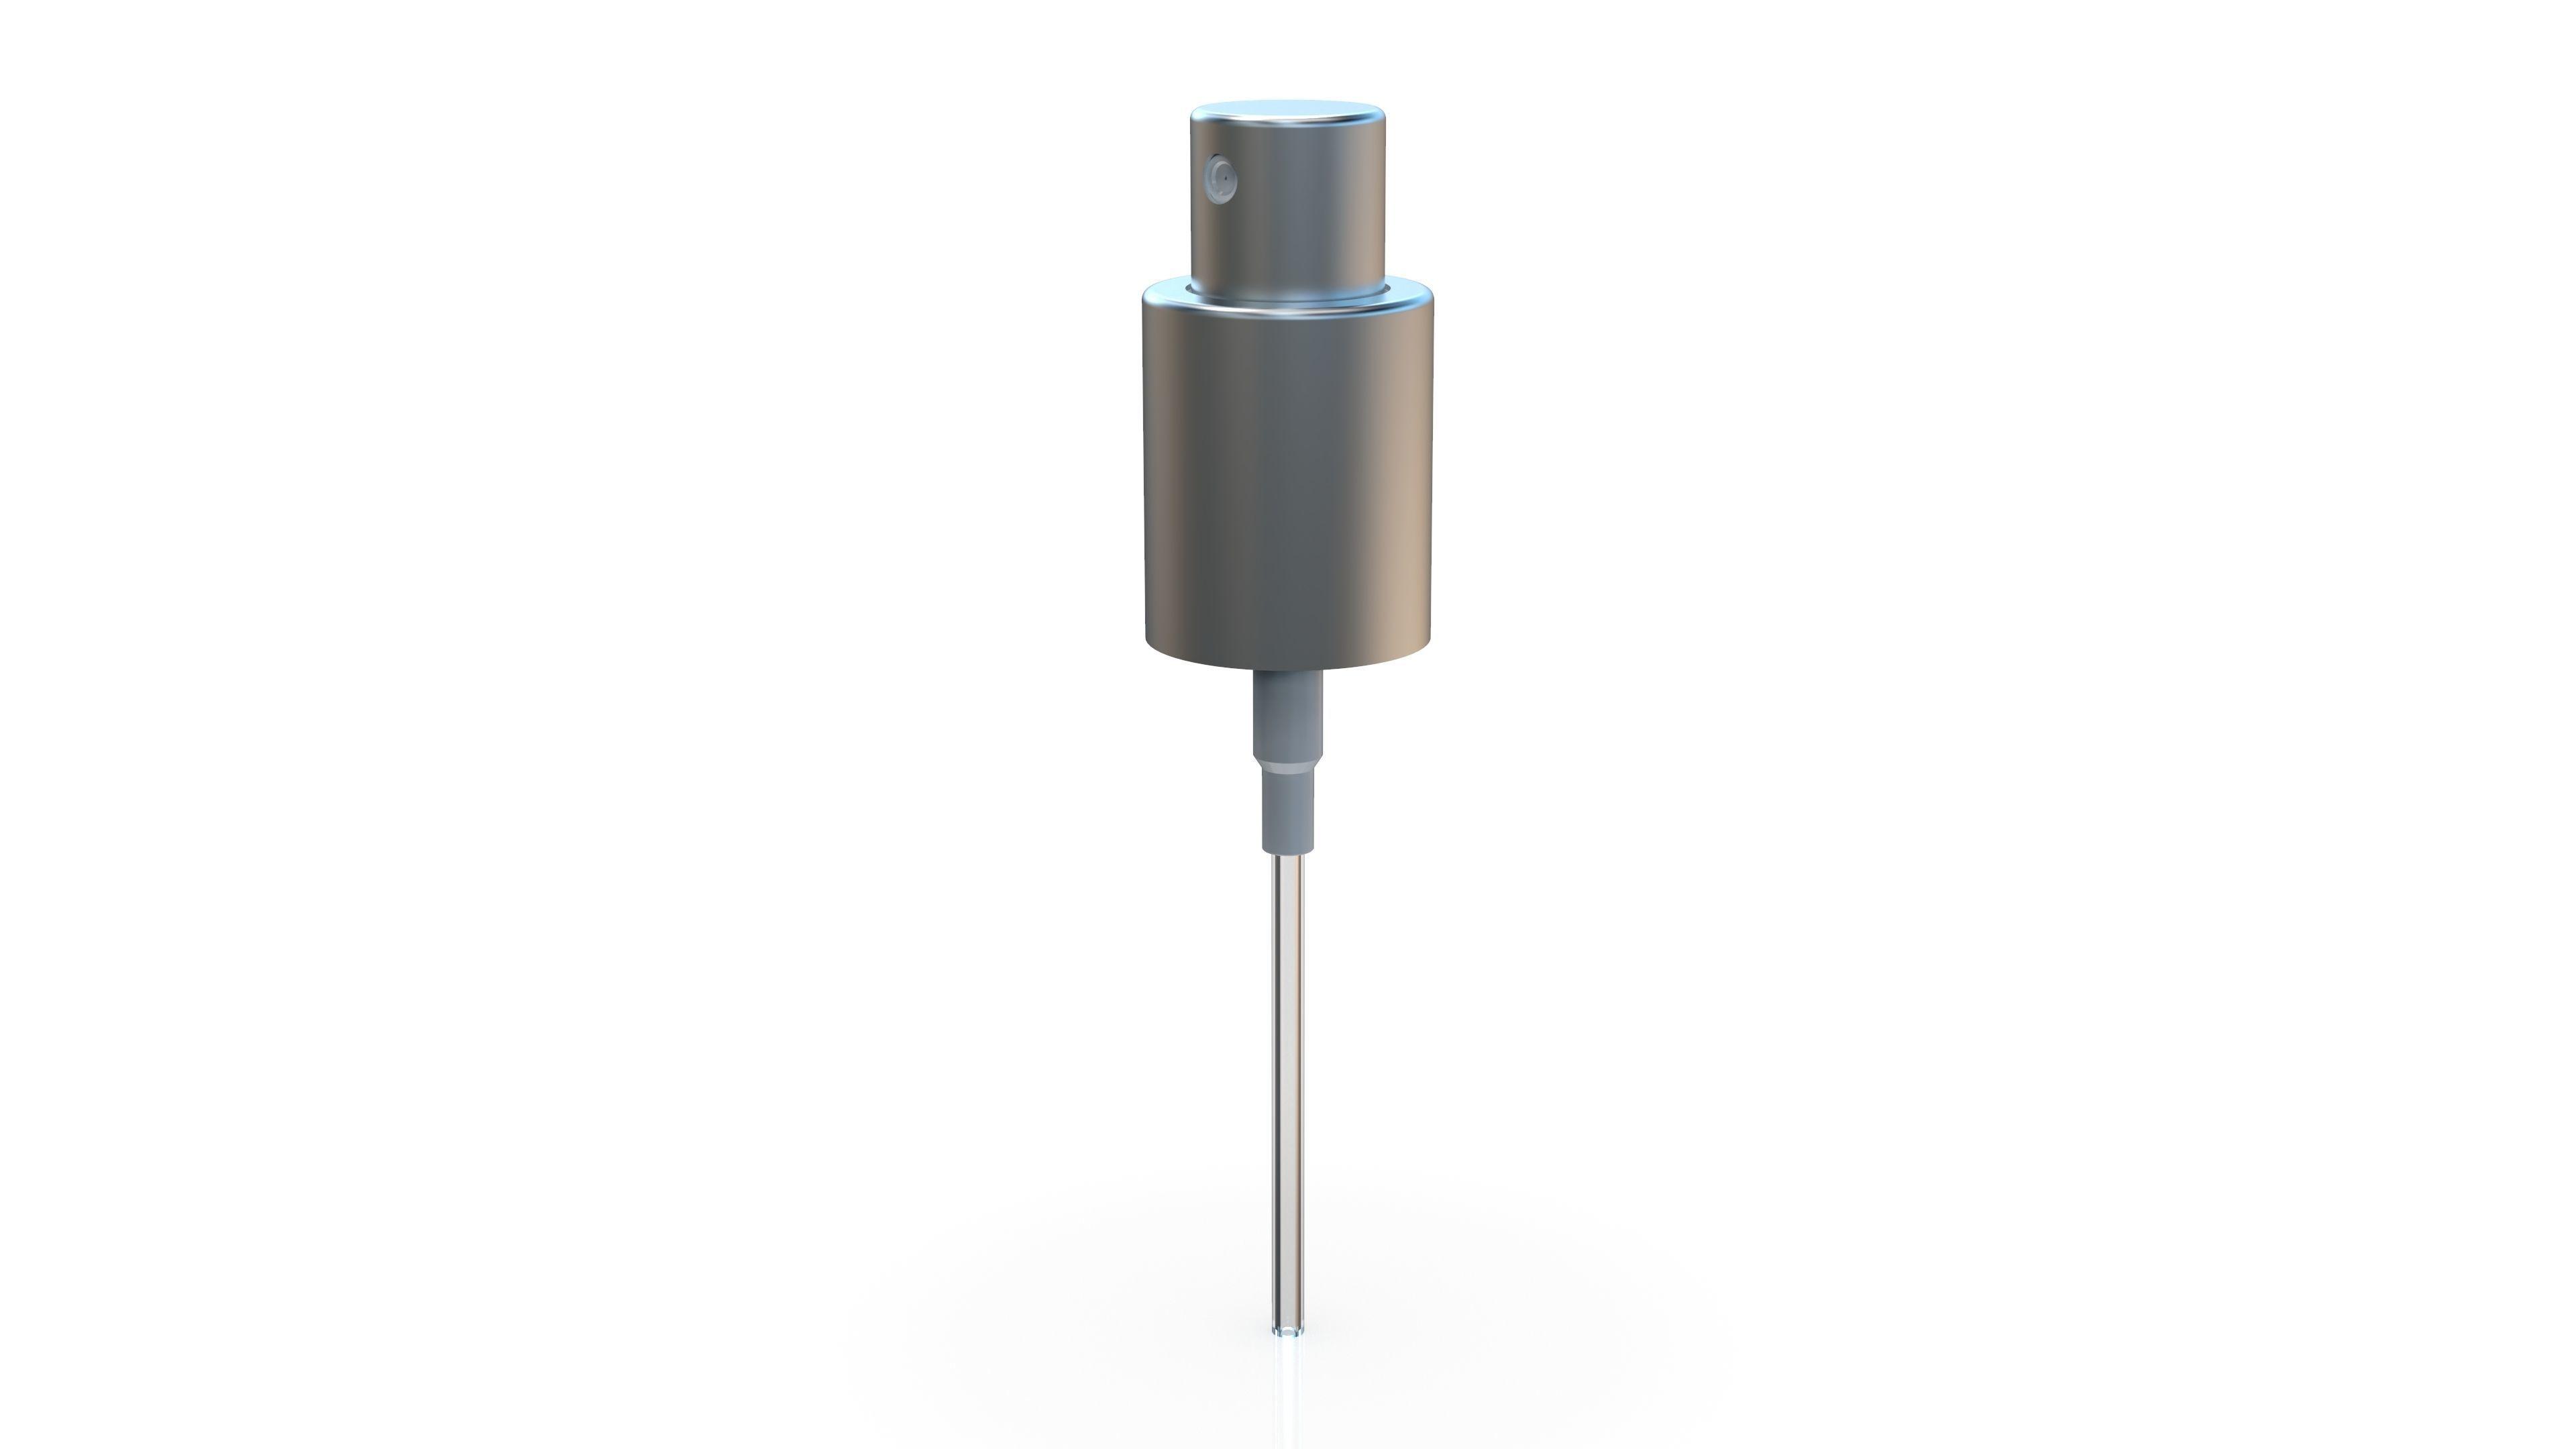 Spray pump - L pipe - 45 mm - Thread SP-415-18 - SP-03-02-00 AL